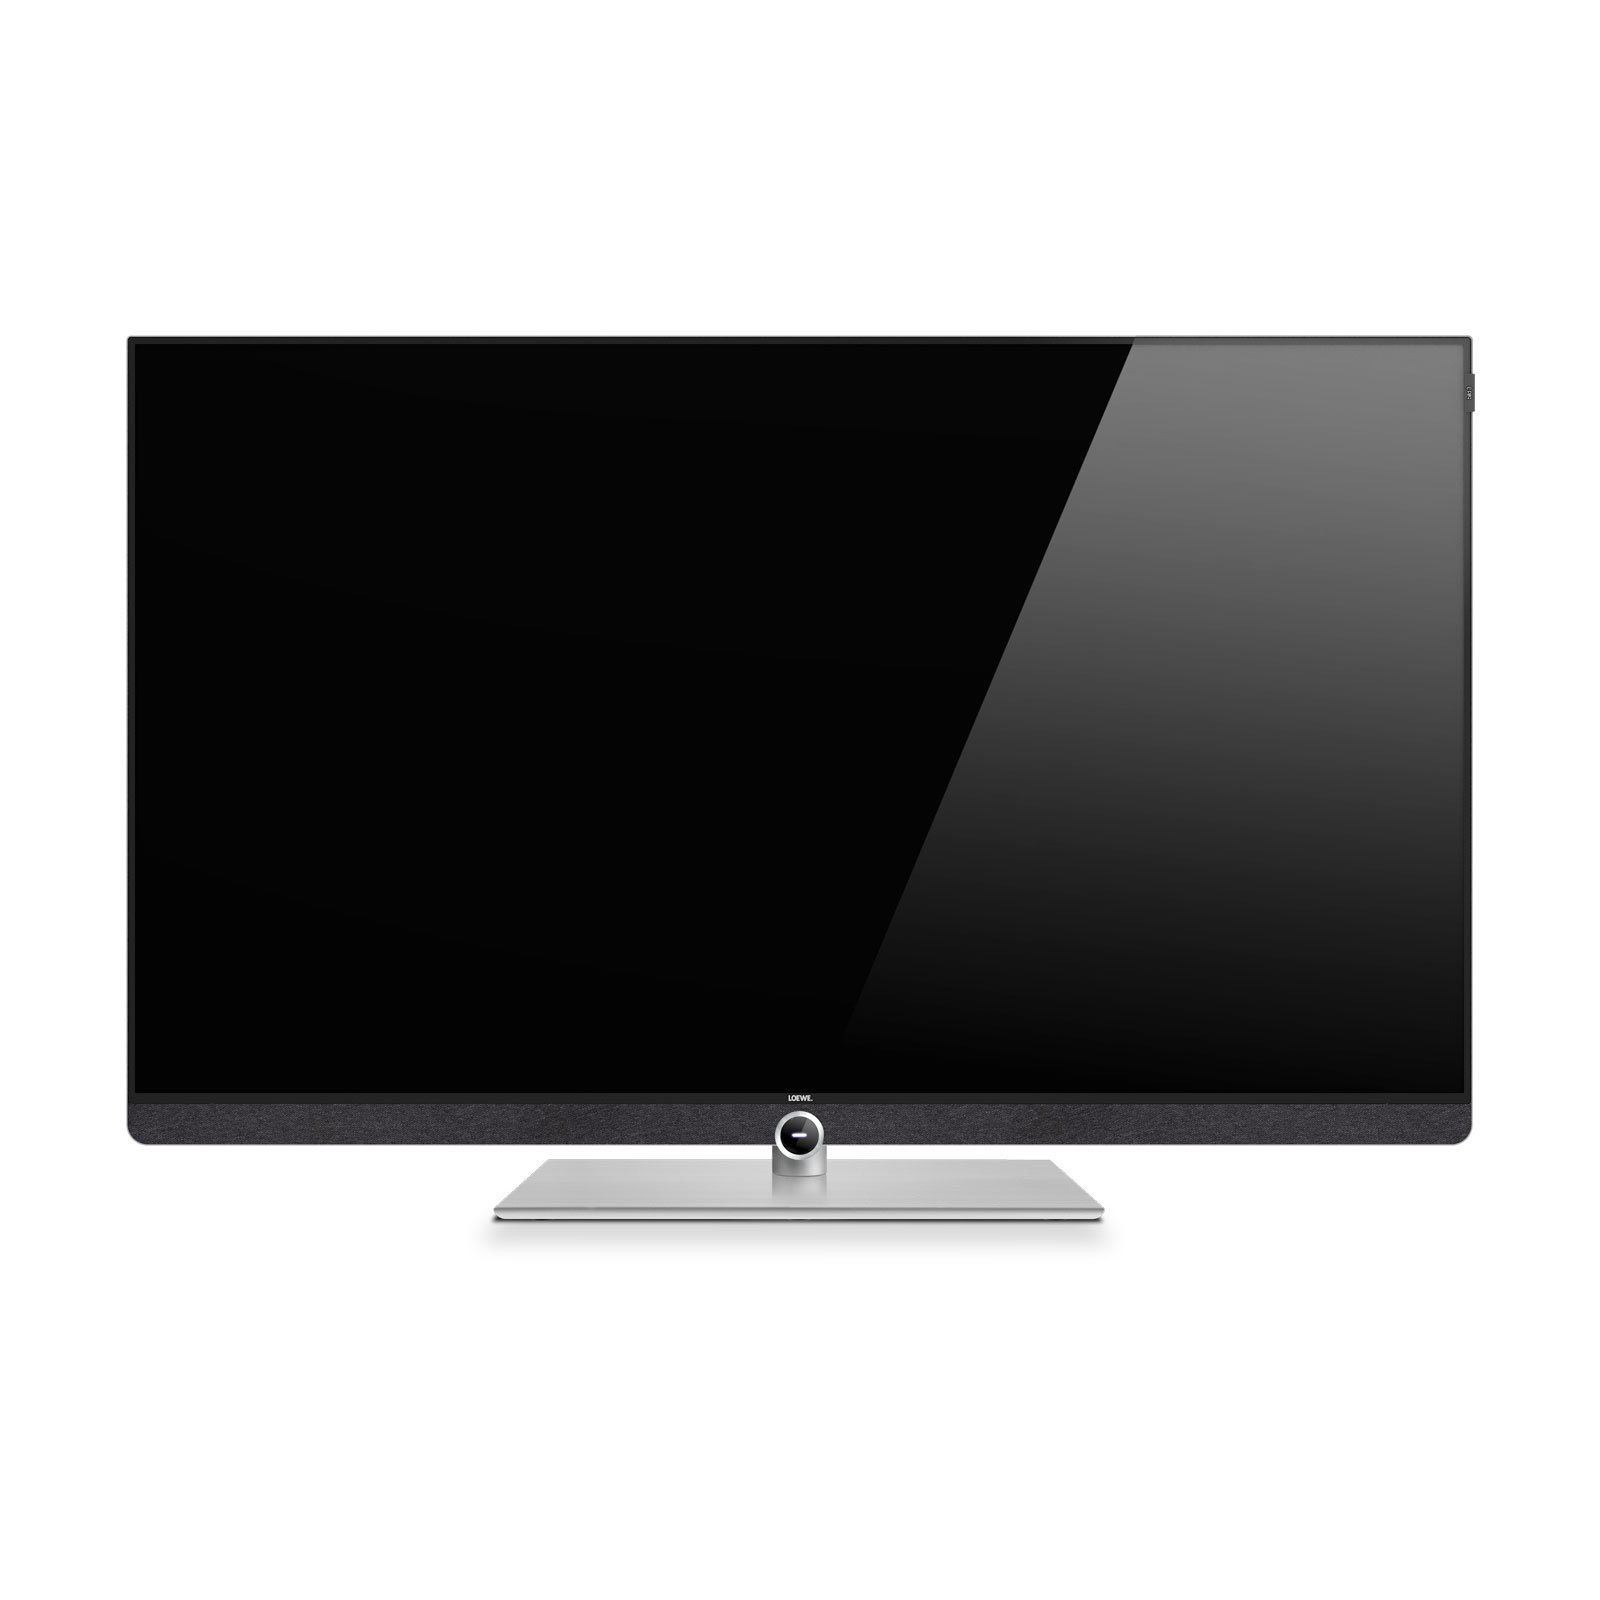 Loewe Bild 3.55 gris grafito – Televisor LED Ultra HD 55 (140 cm) 16/9 – 3840 x 2160 píxeles – Tnt, cable y Satellite HD – Wi-Fi – UHD 2160p – 3d Active: Amazon.es: Informática